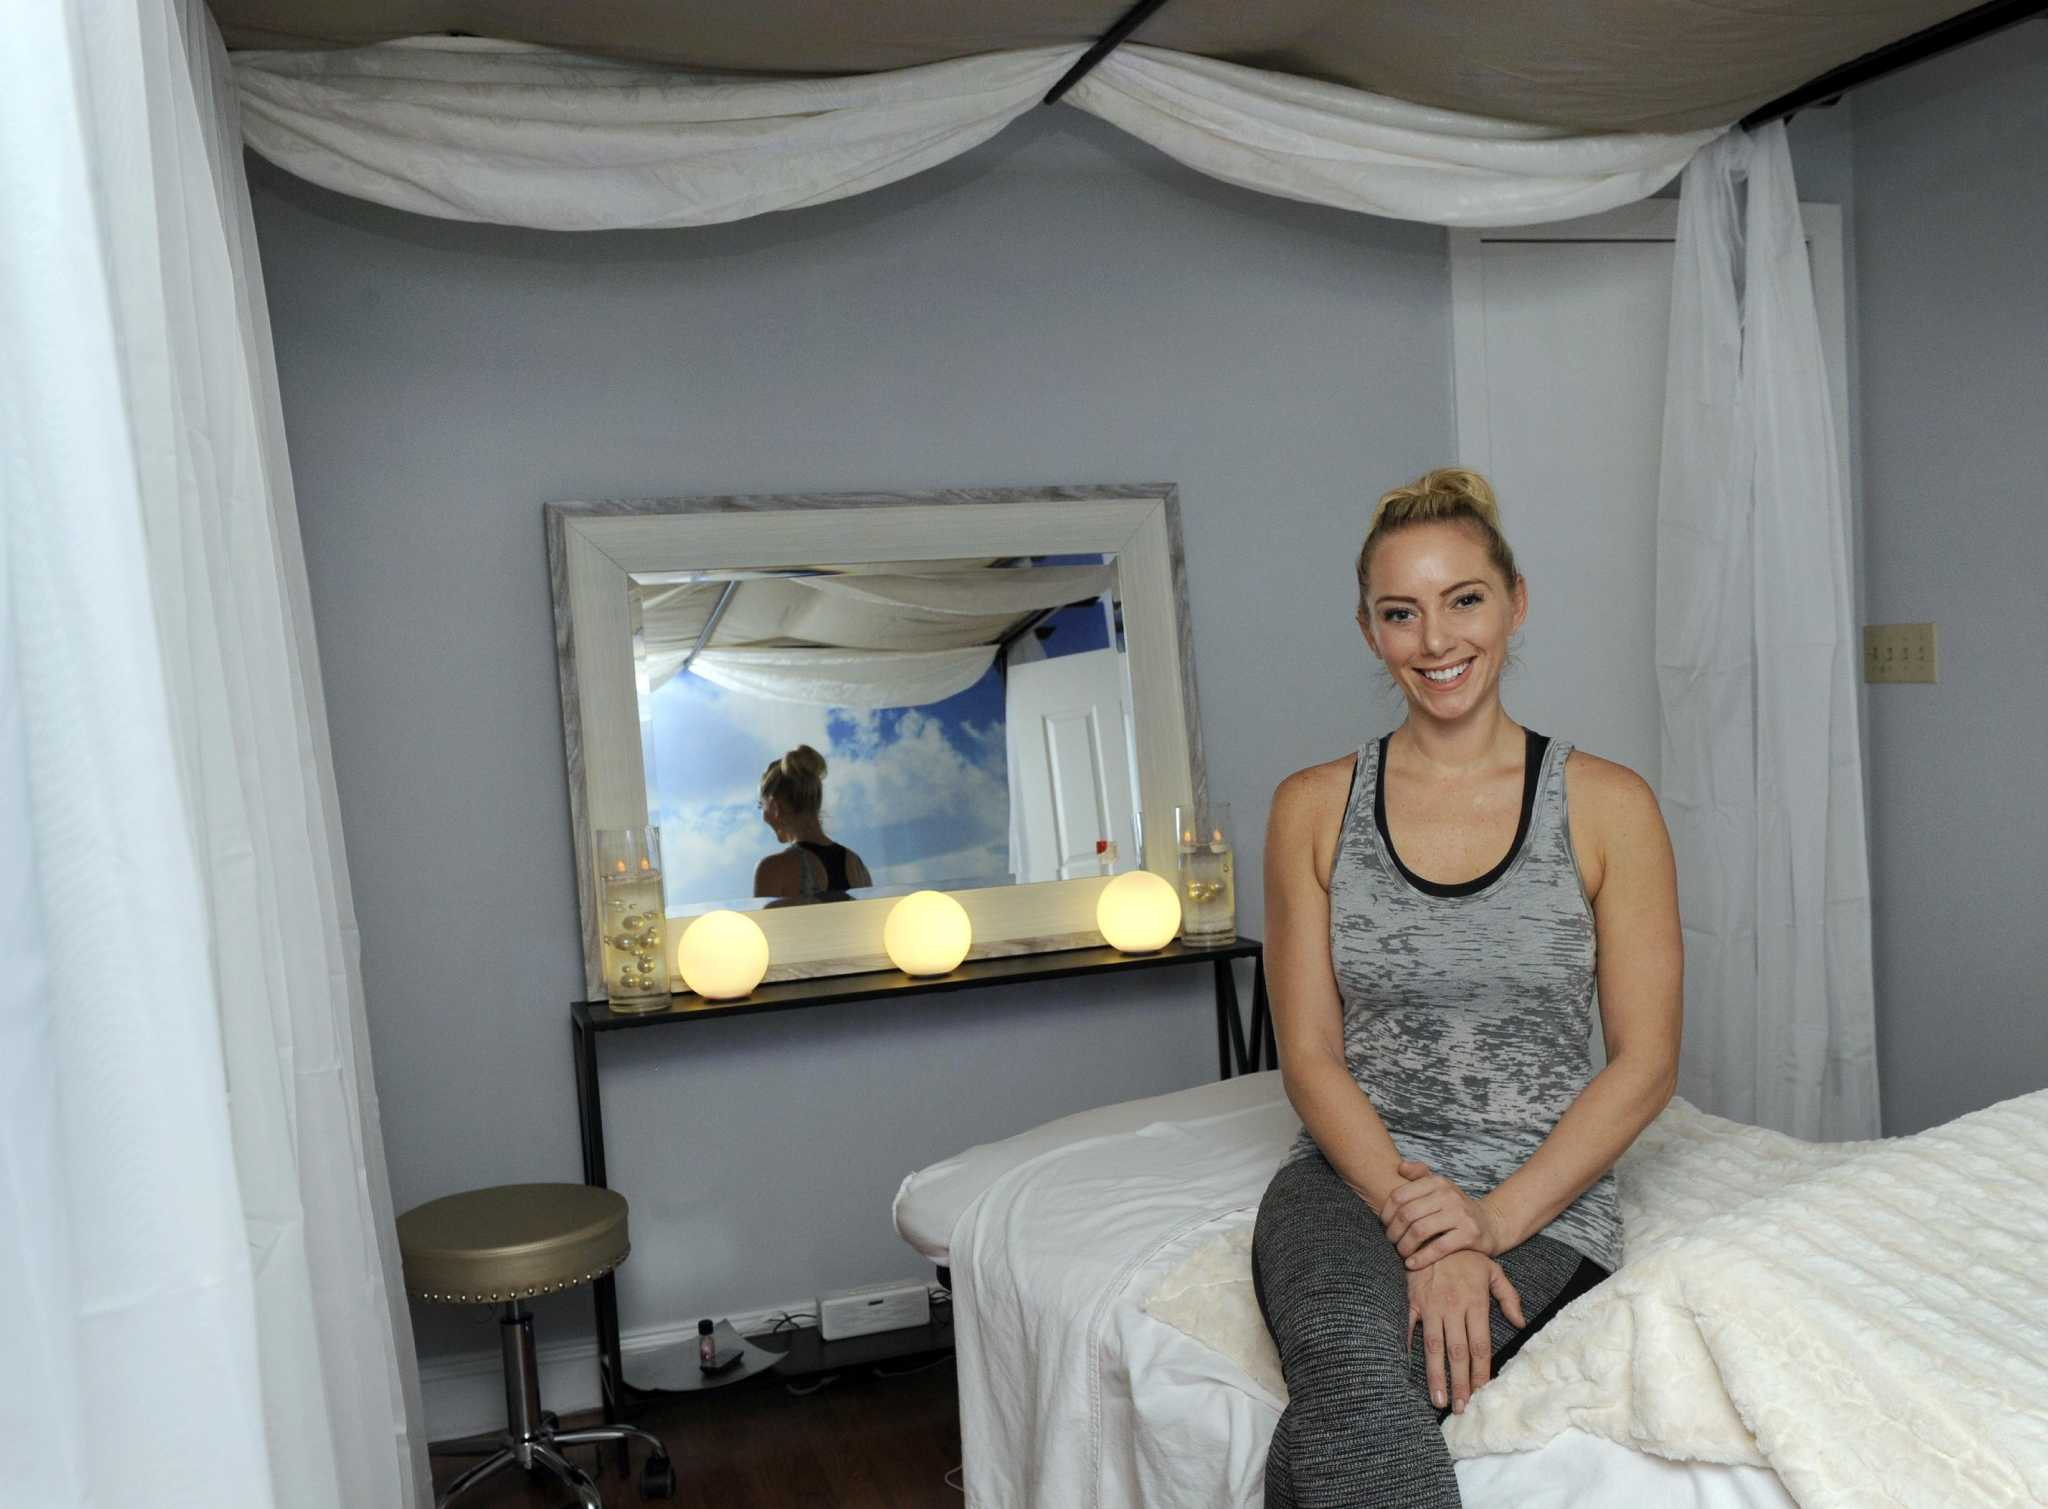 Danbury massage business expands; adds spa services